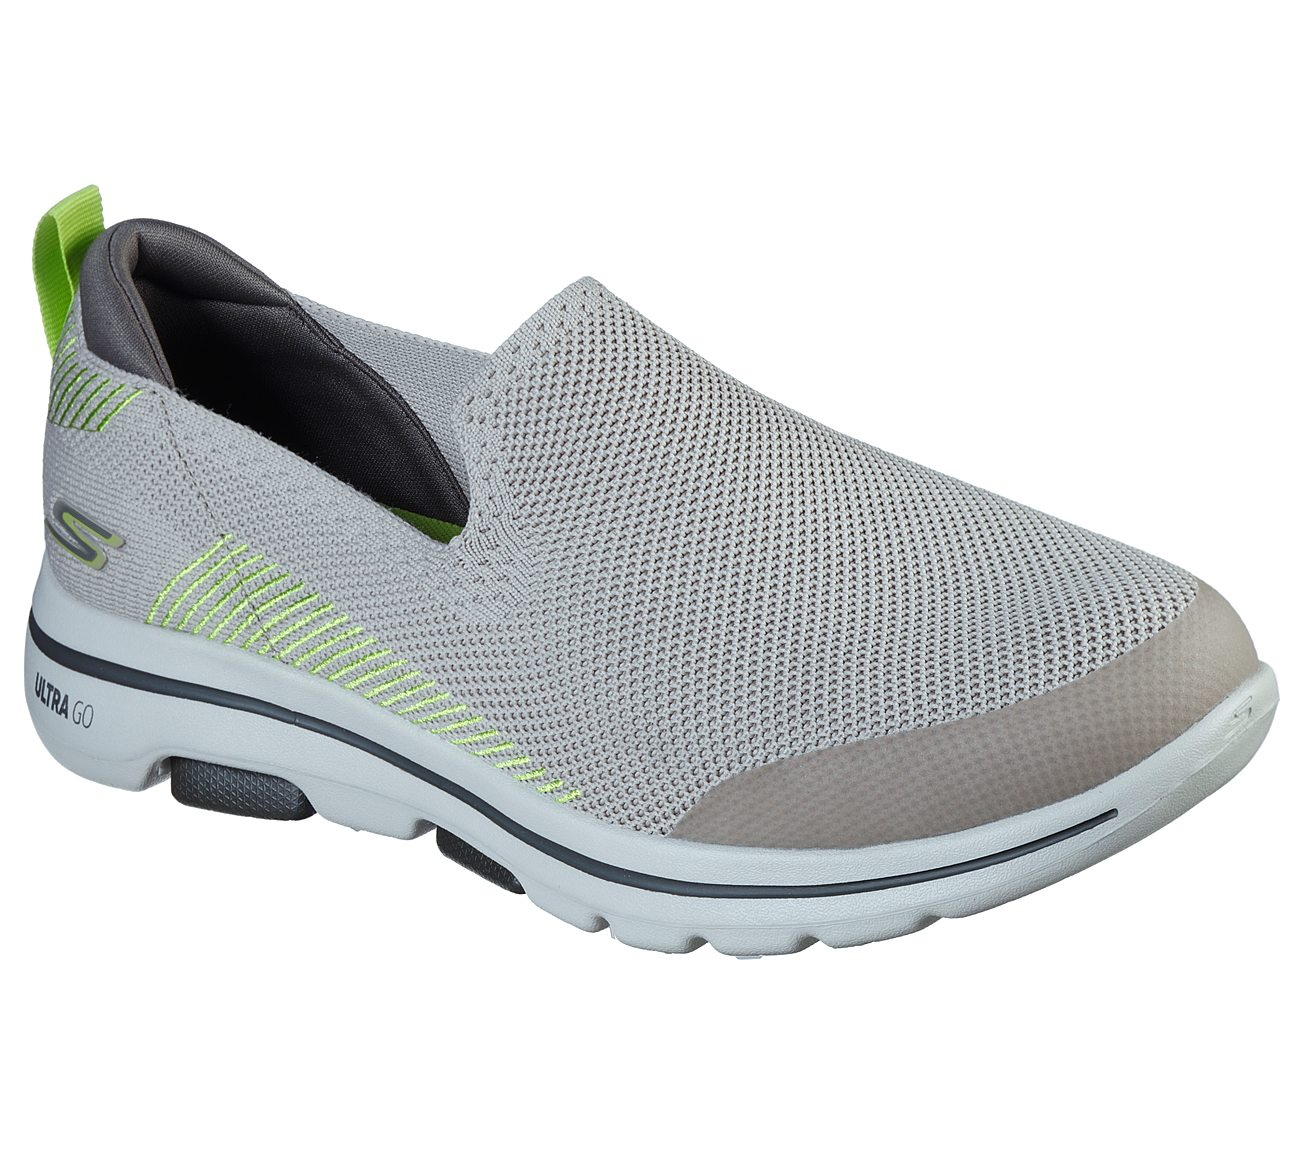 skechers go walk shoes extra wide